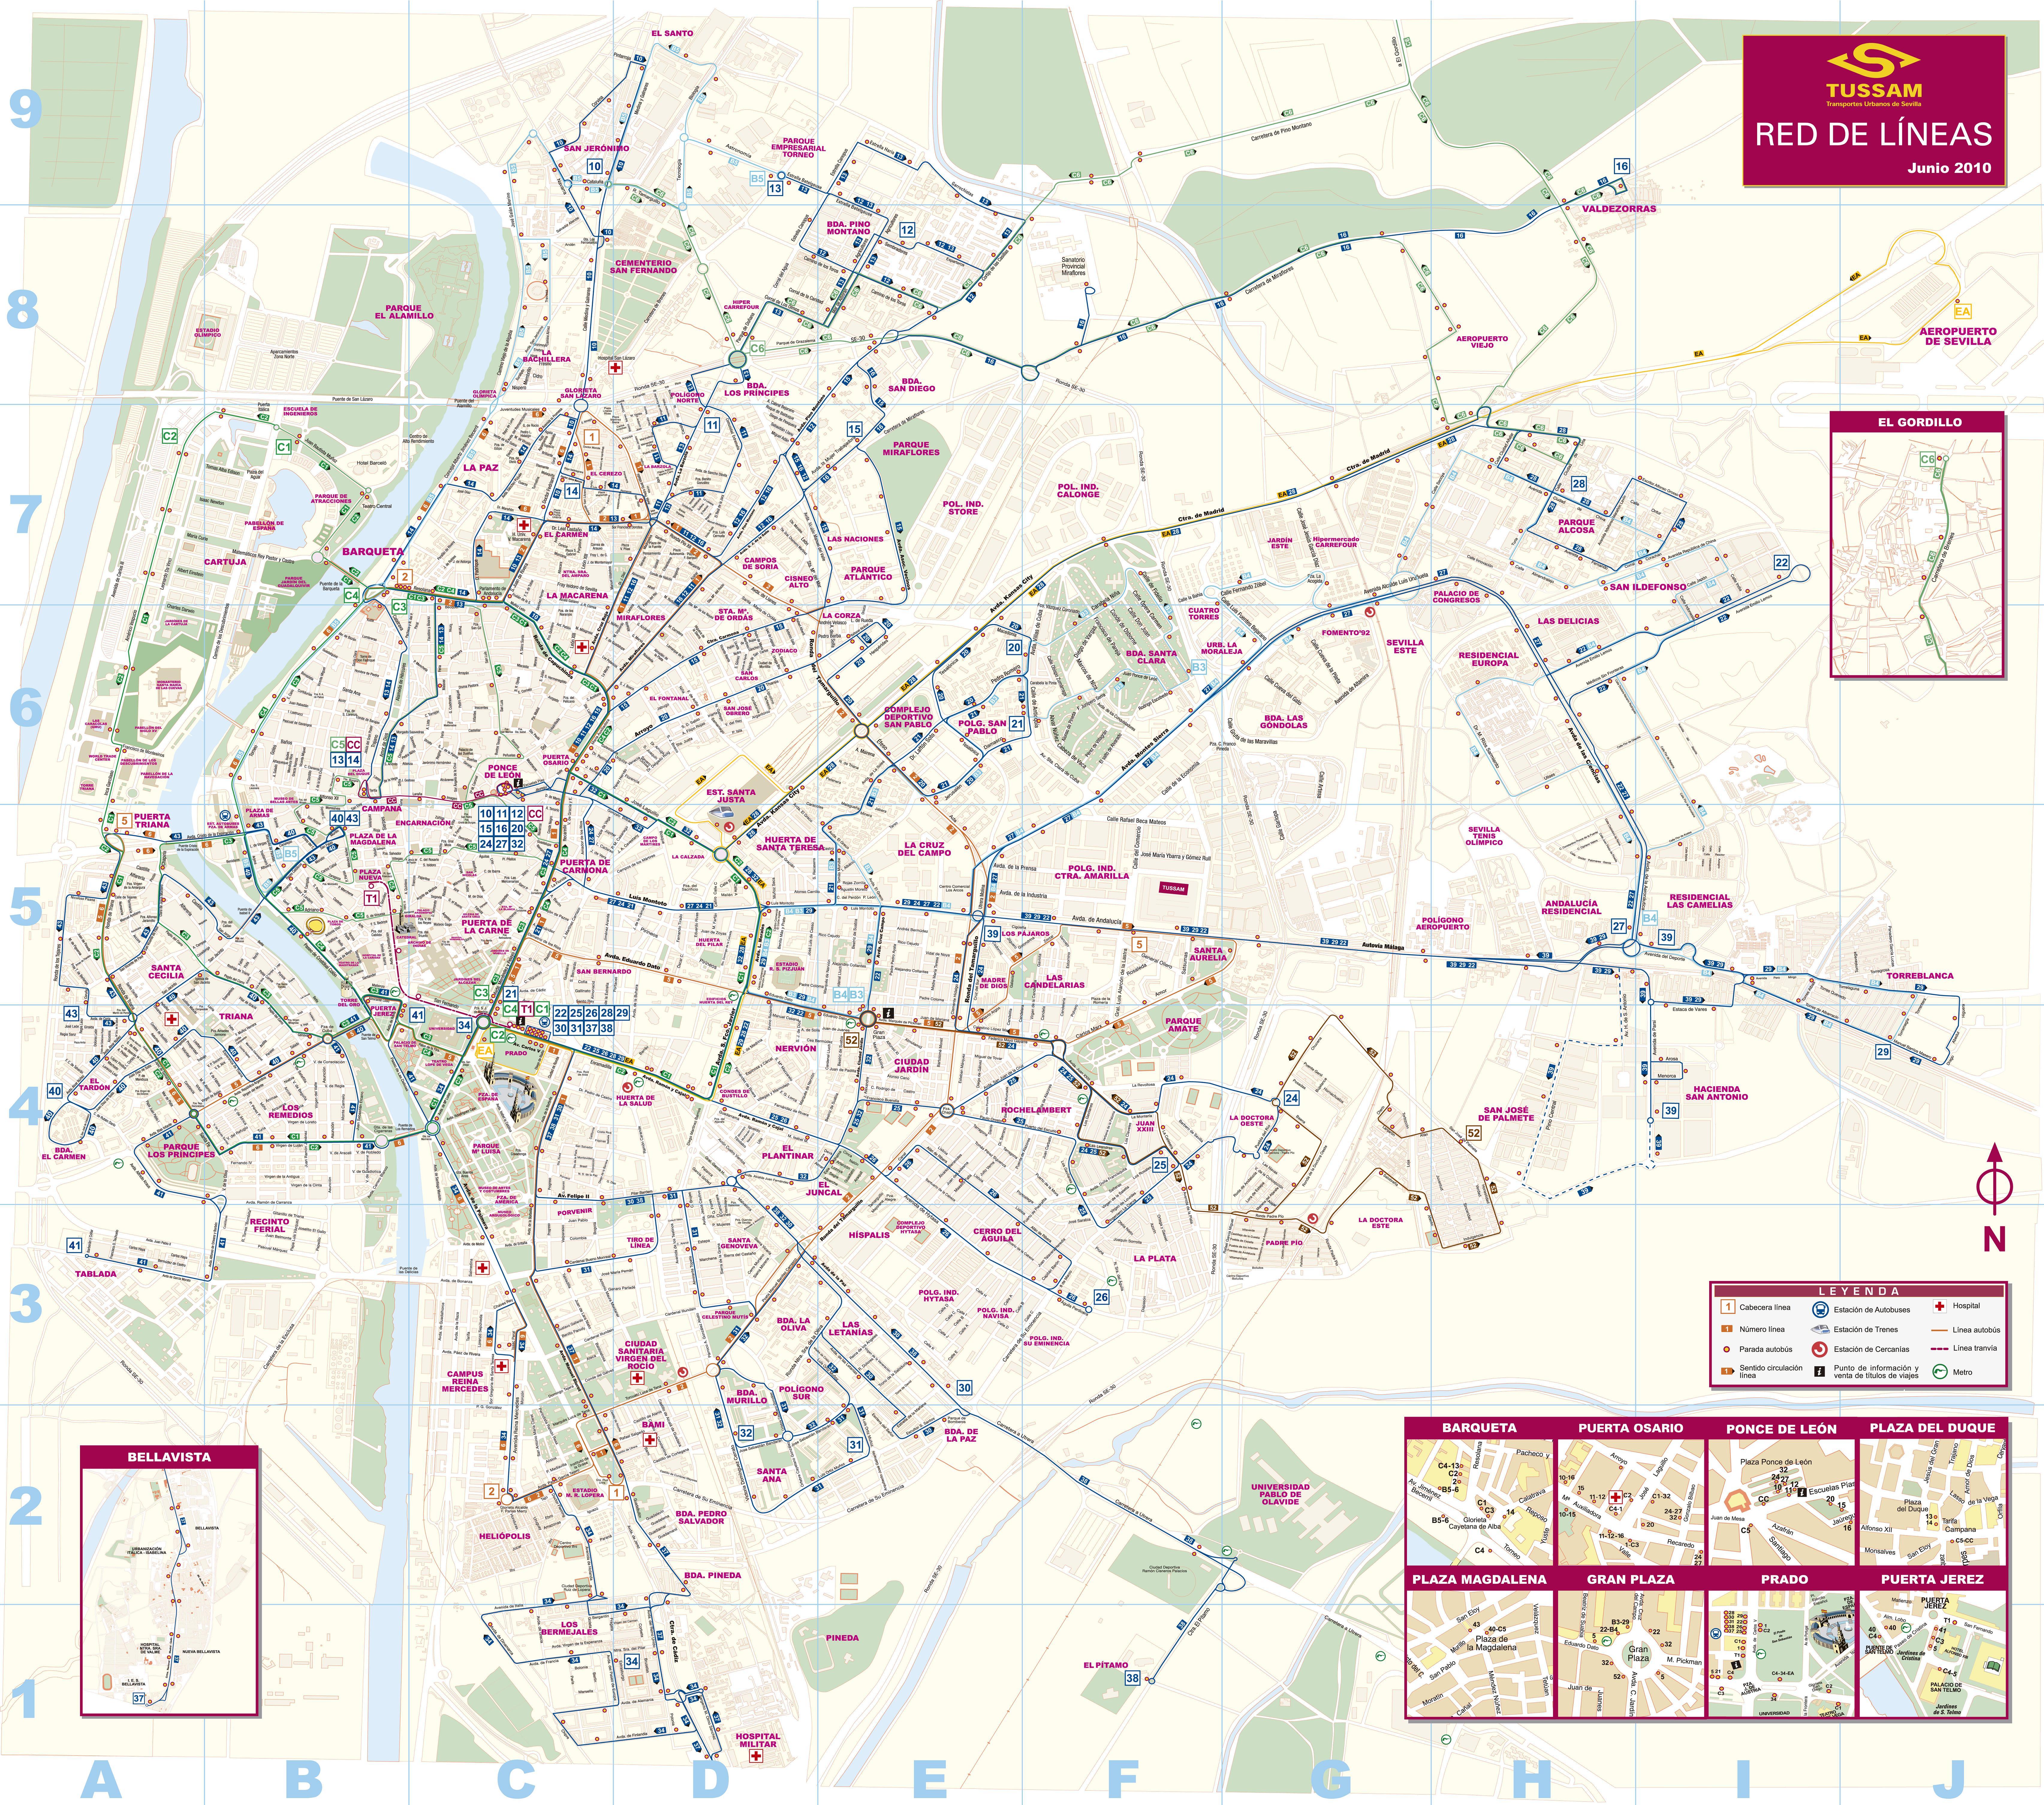 Seville's collective urban transport 2010